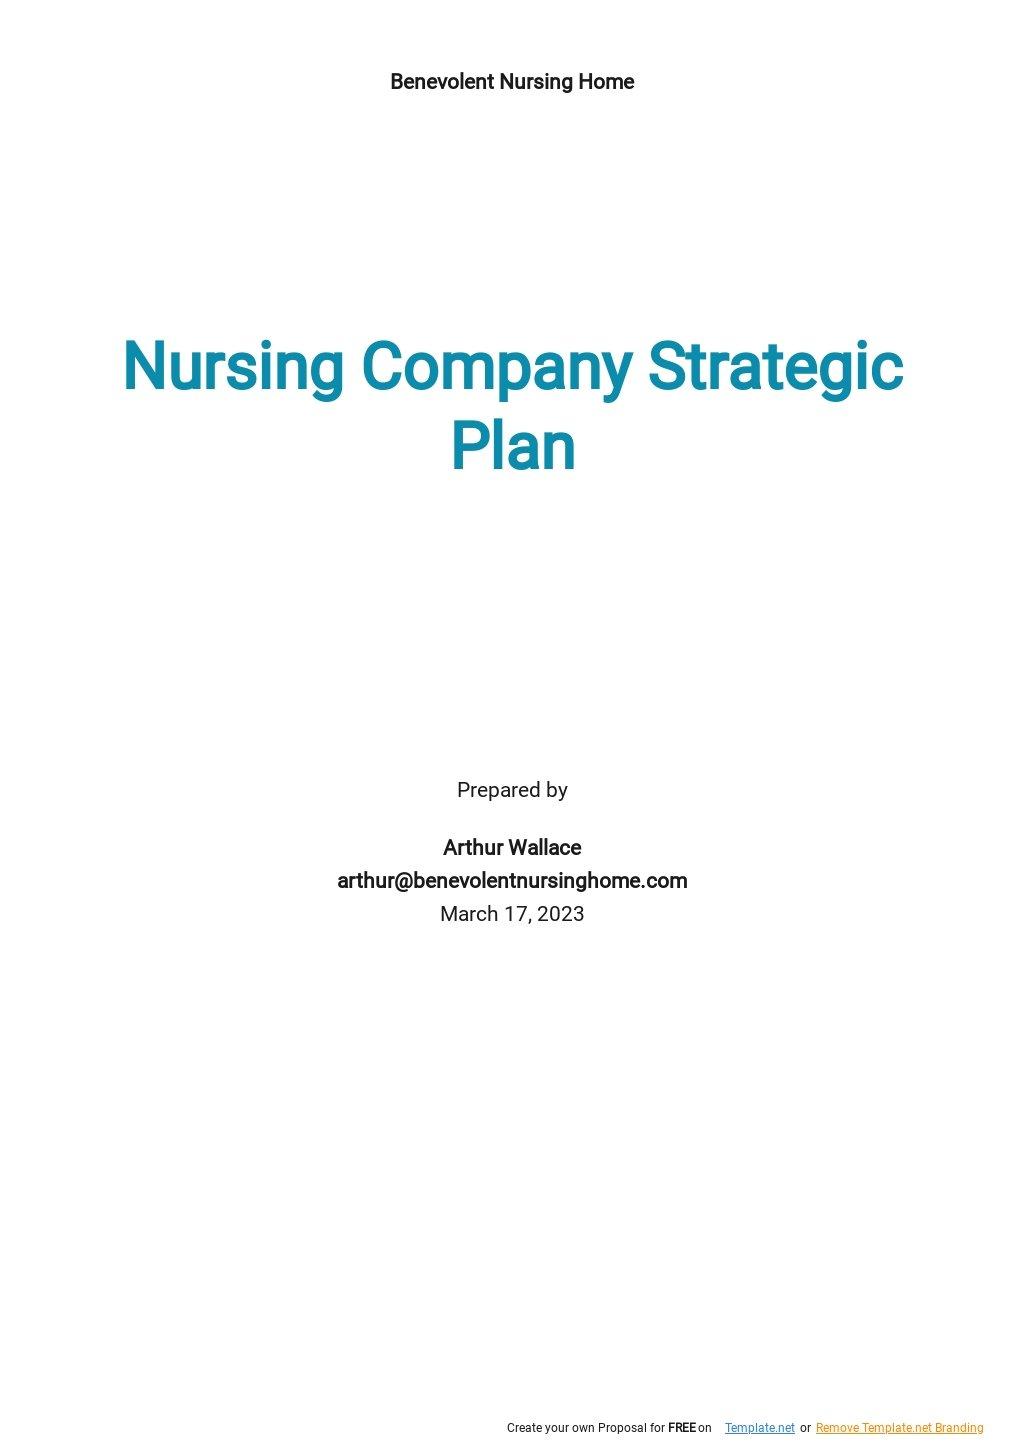 Nursing Company Strategic Plan Template.jpe